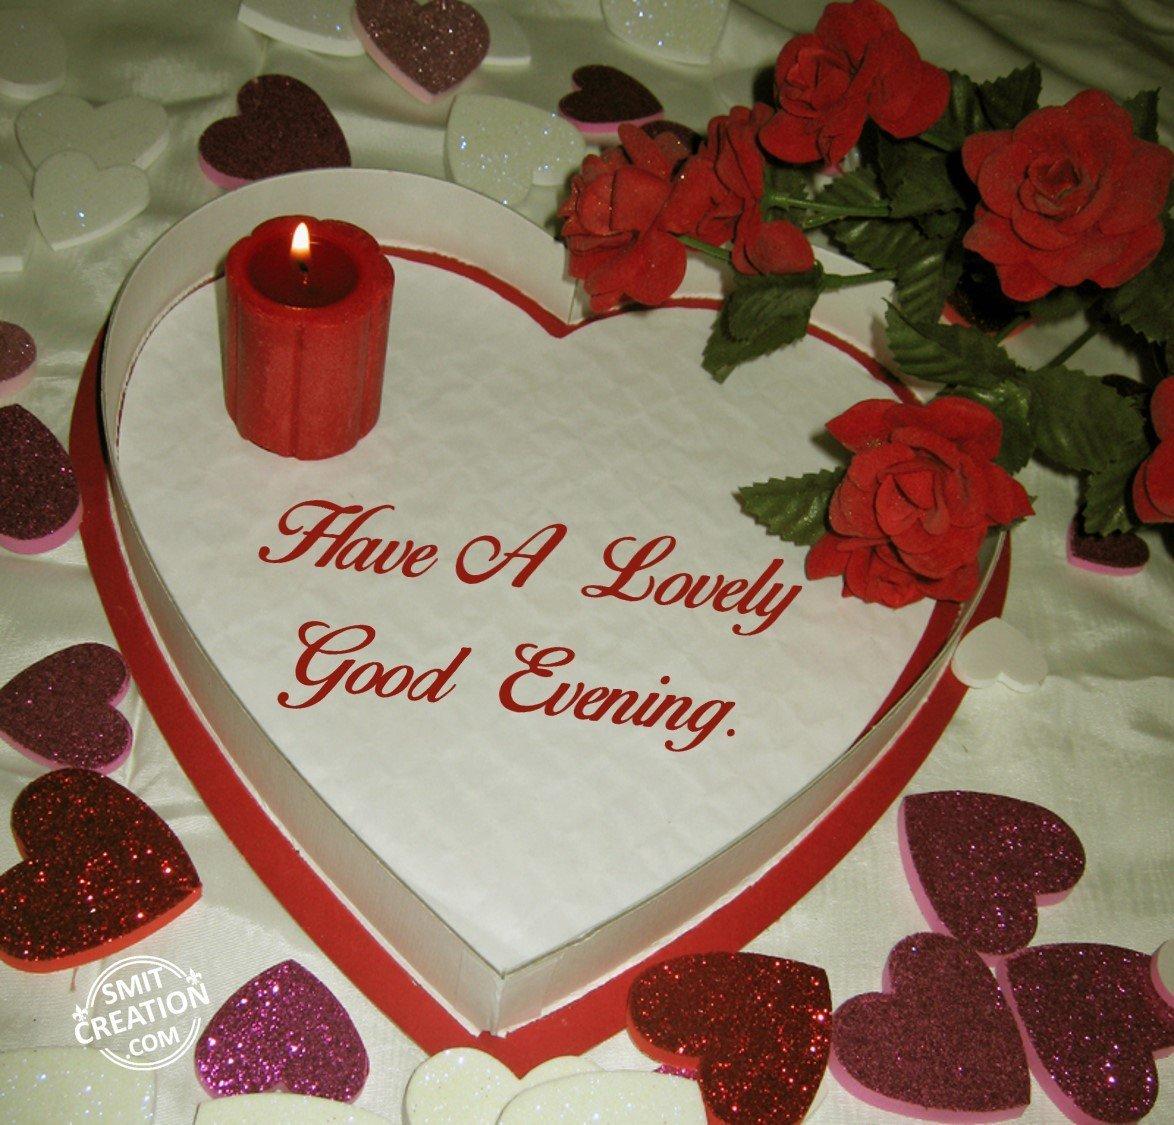 Have A Lovely Good Evening Smitcreationcom